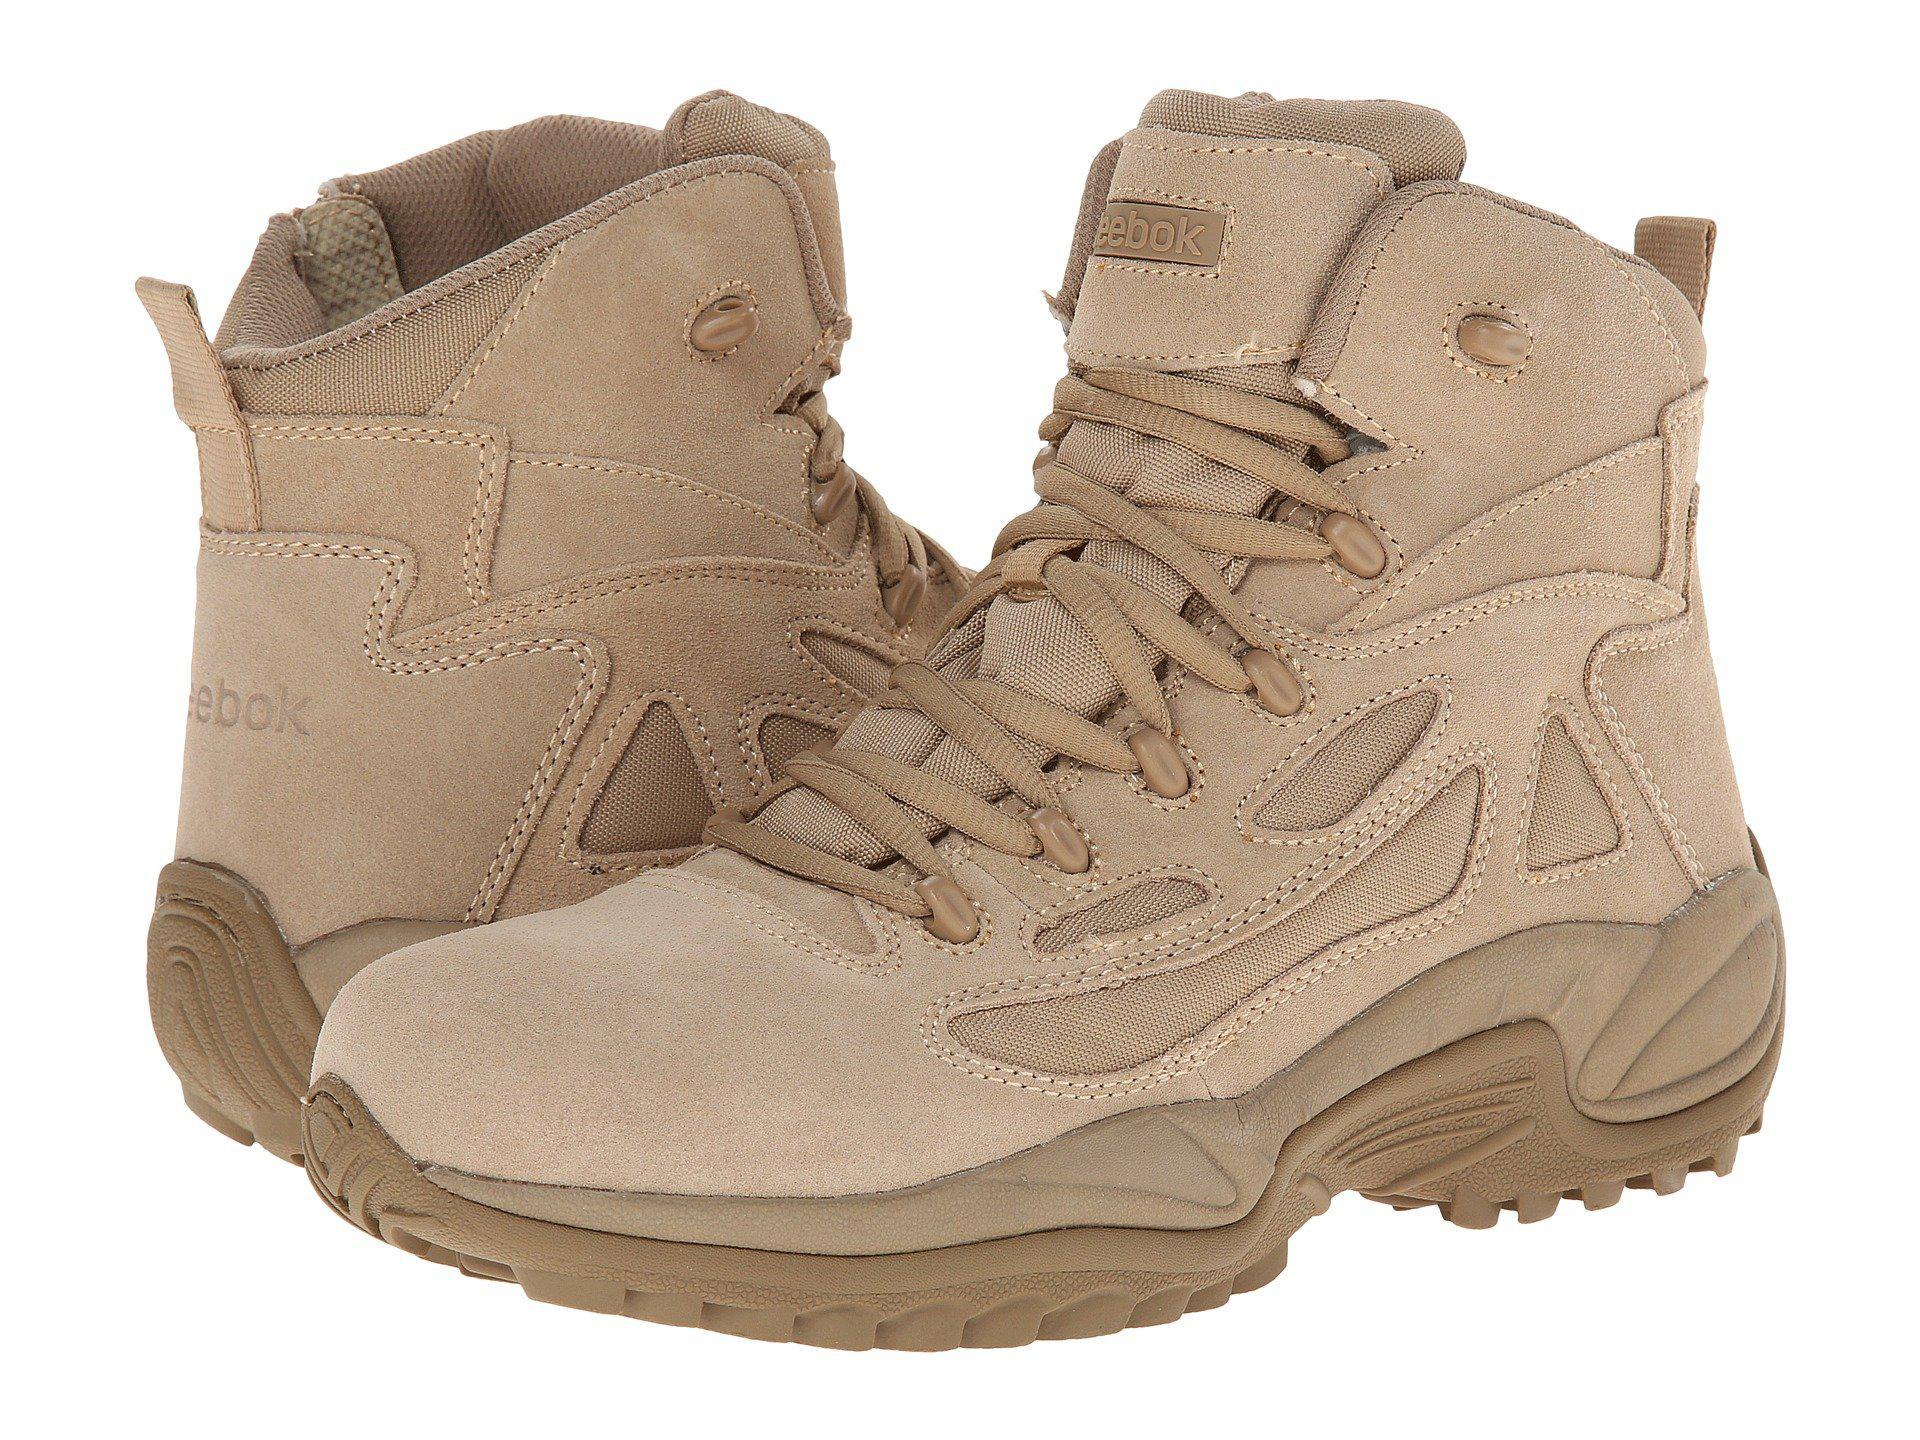 61b473f67bde Lyst - Reebok Rapid Response 6 (desert Tan) Men s Work Boots in ...